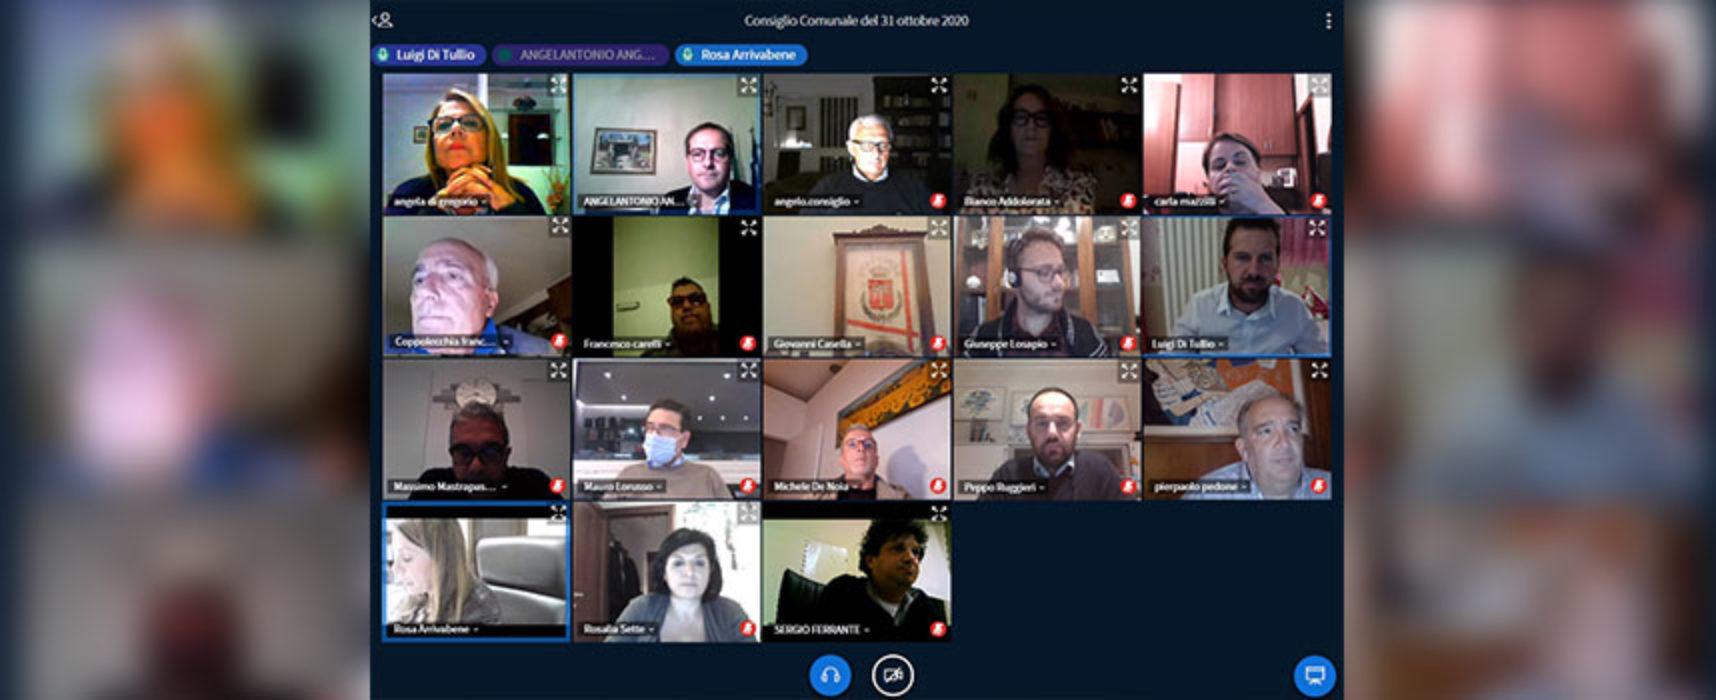 Consiglio comunale in videoconferenza, i punti in discussione